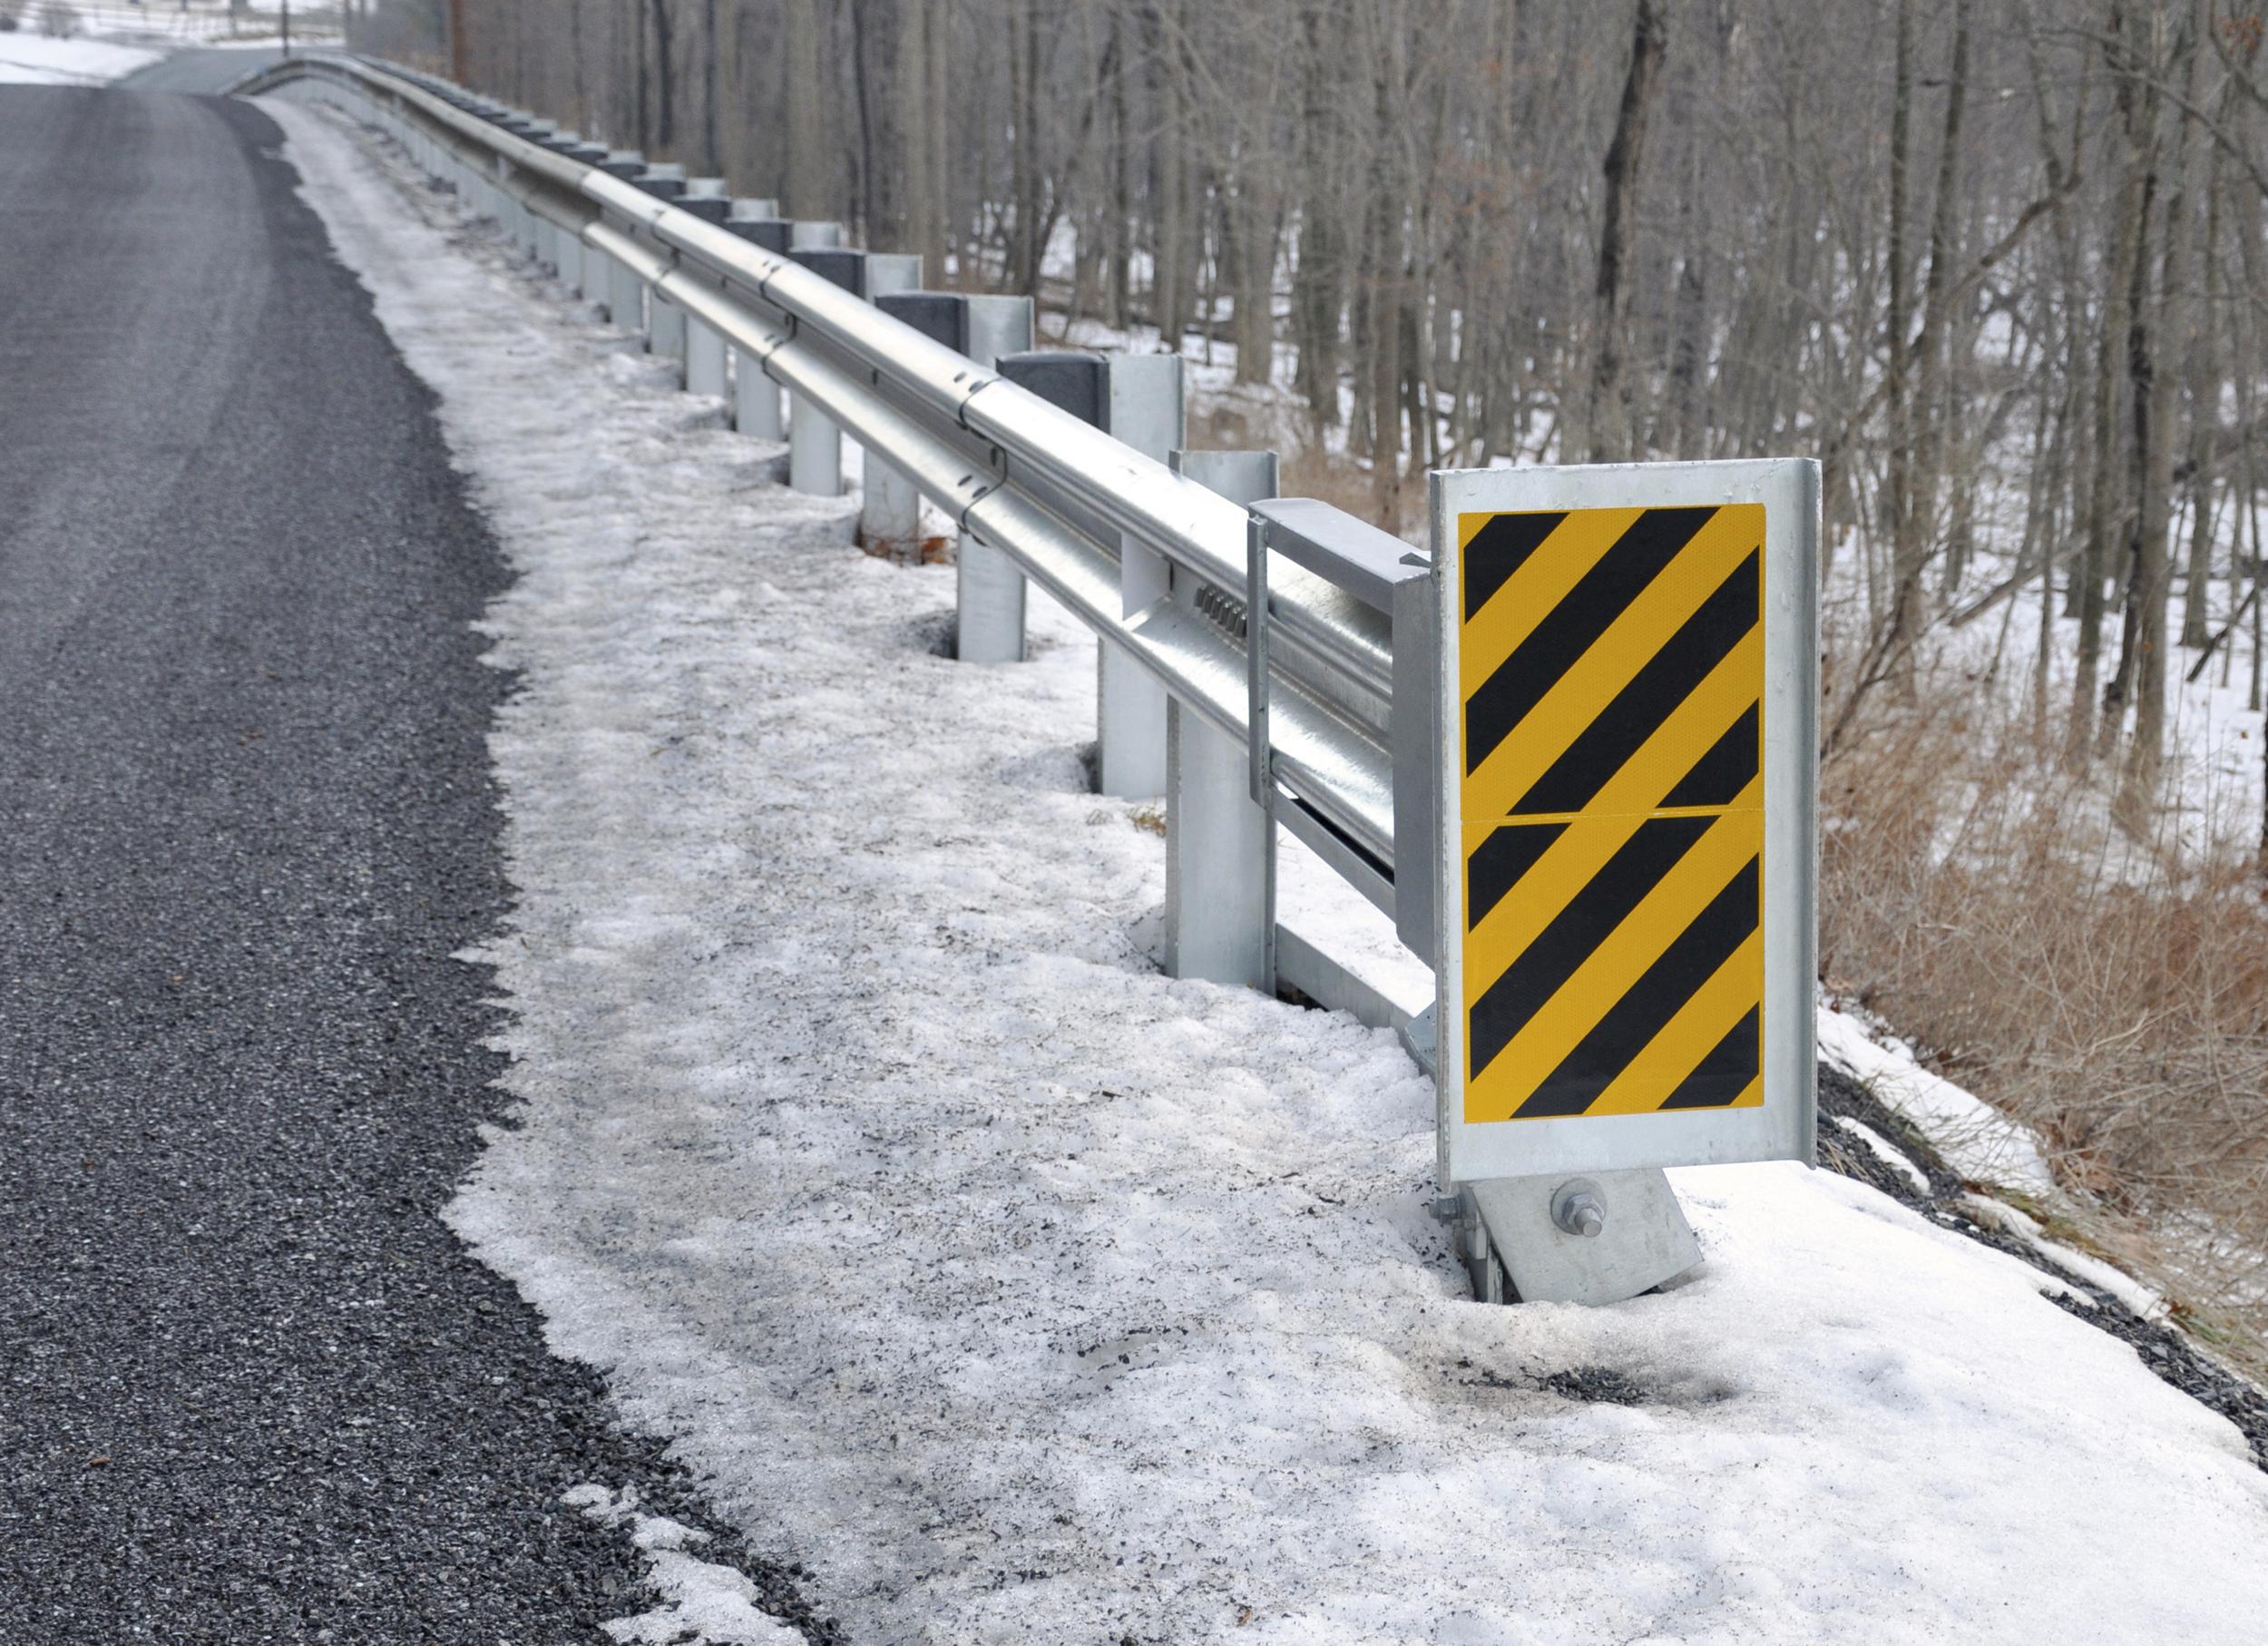 Guardrail end treatments